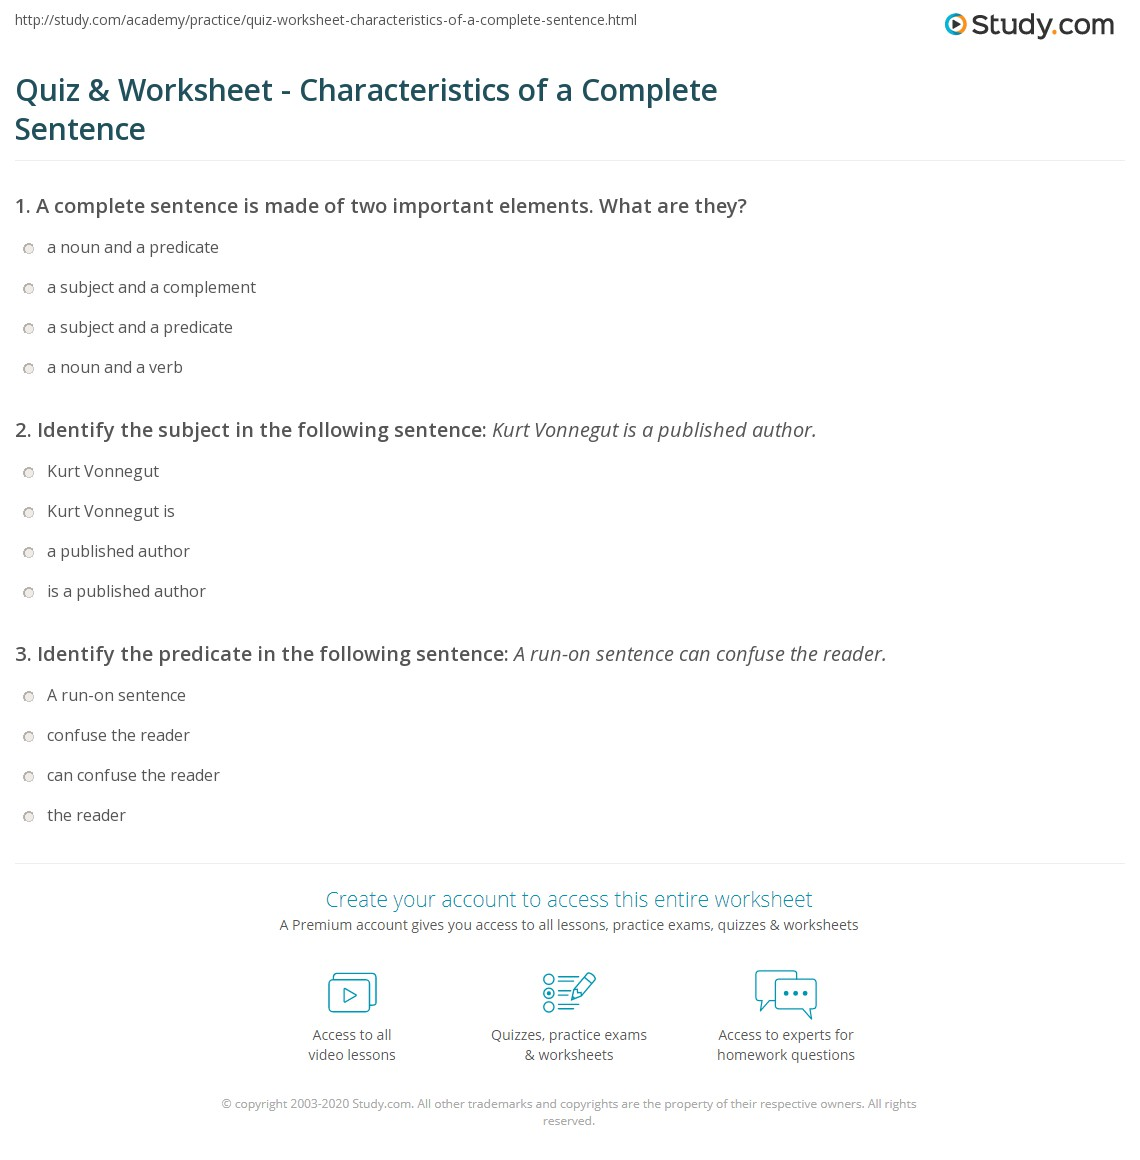 Quiz Worksheet Characteristics of a Complete Sentence – Complete Sentence Worksheet